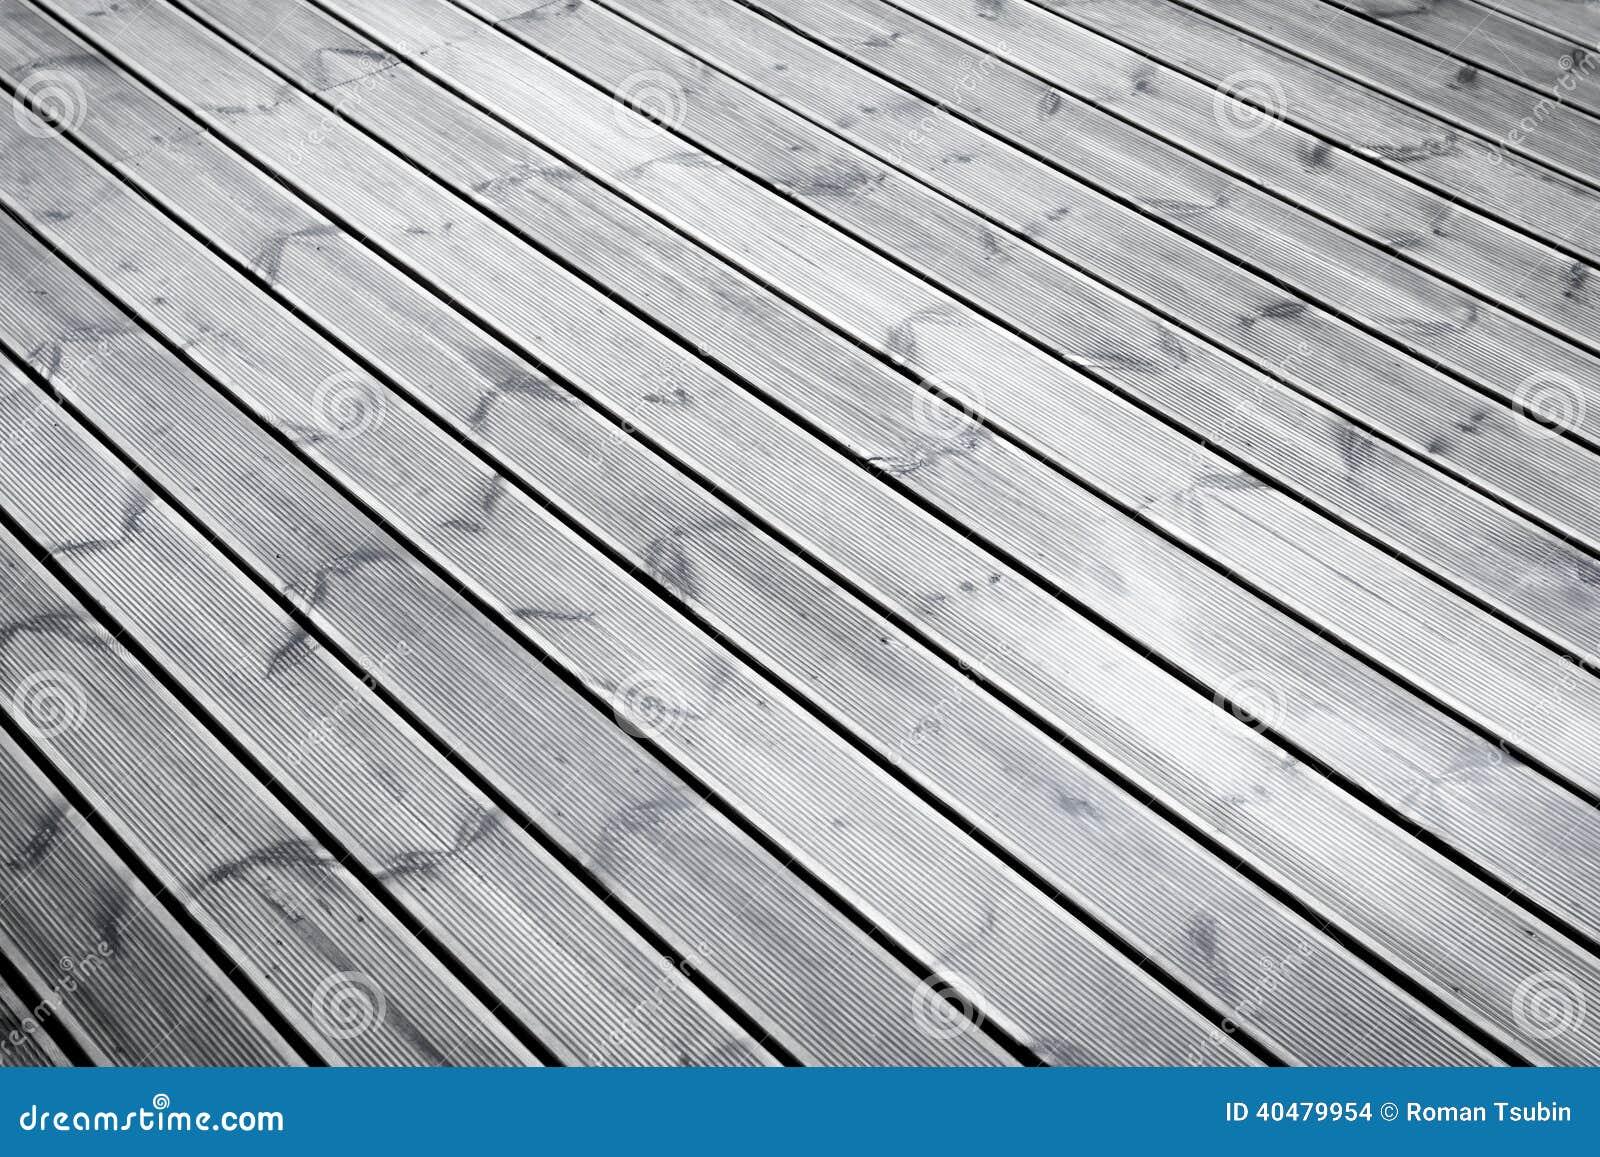 Natte terras bruine houten vloer stock foto afbeelding 40479954 - Terras hout ...